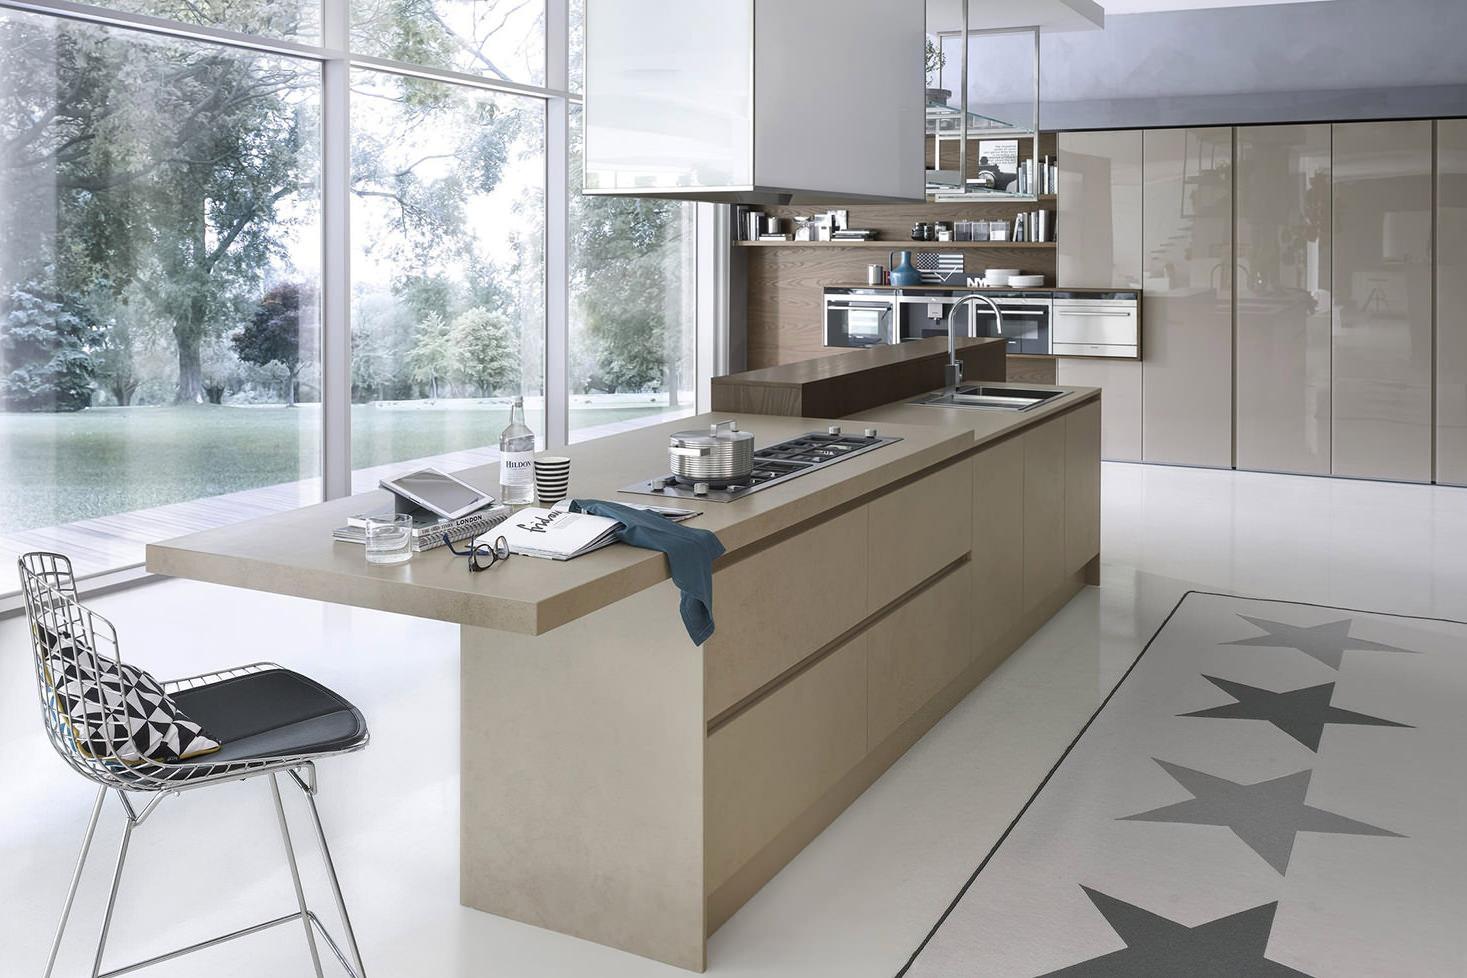 Коричнево-белая глянцевая кухня